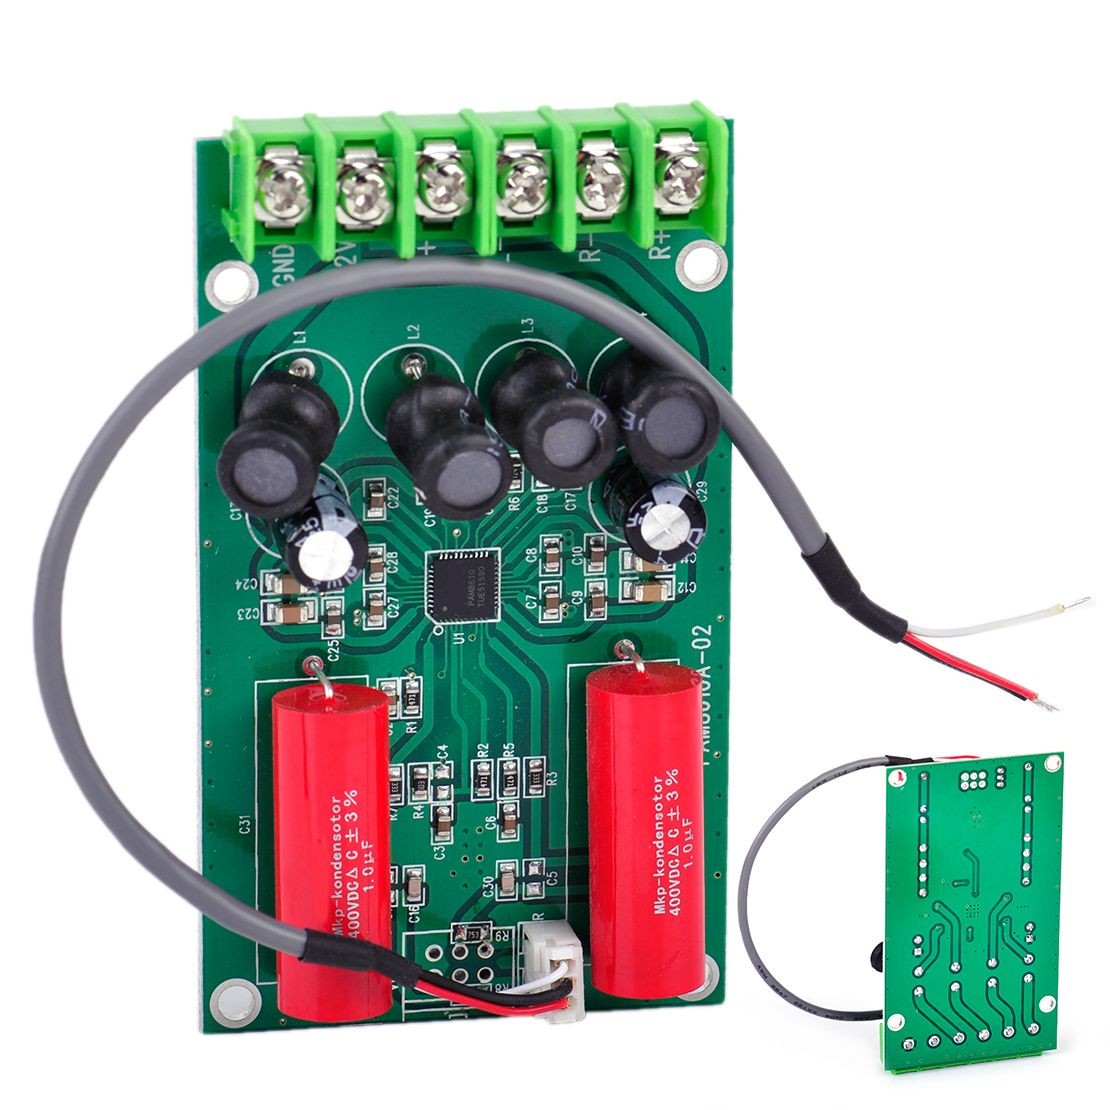 Dwcx 12v Car Ta2024 Mini Digital Audio Amp Amplifier Board Module Pc Hifi Replace For Mercedes Benz Audi Bmw Vw Golf Beetle Ebay Tv Videos Electronic Products